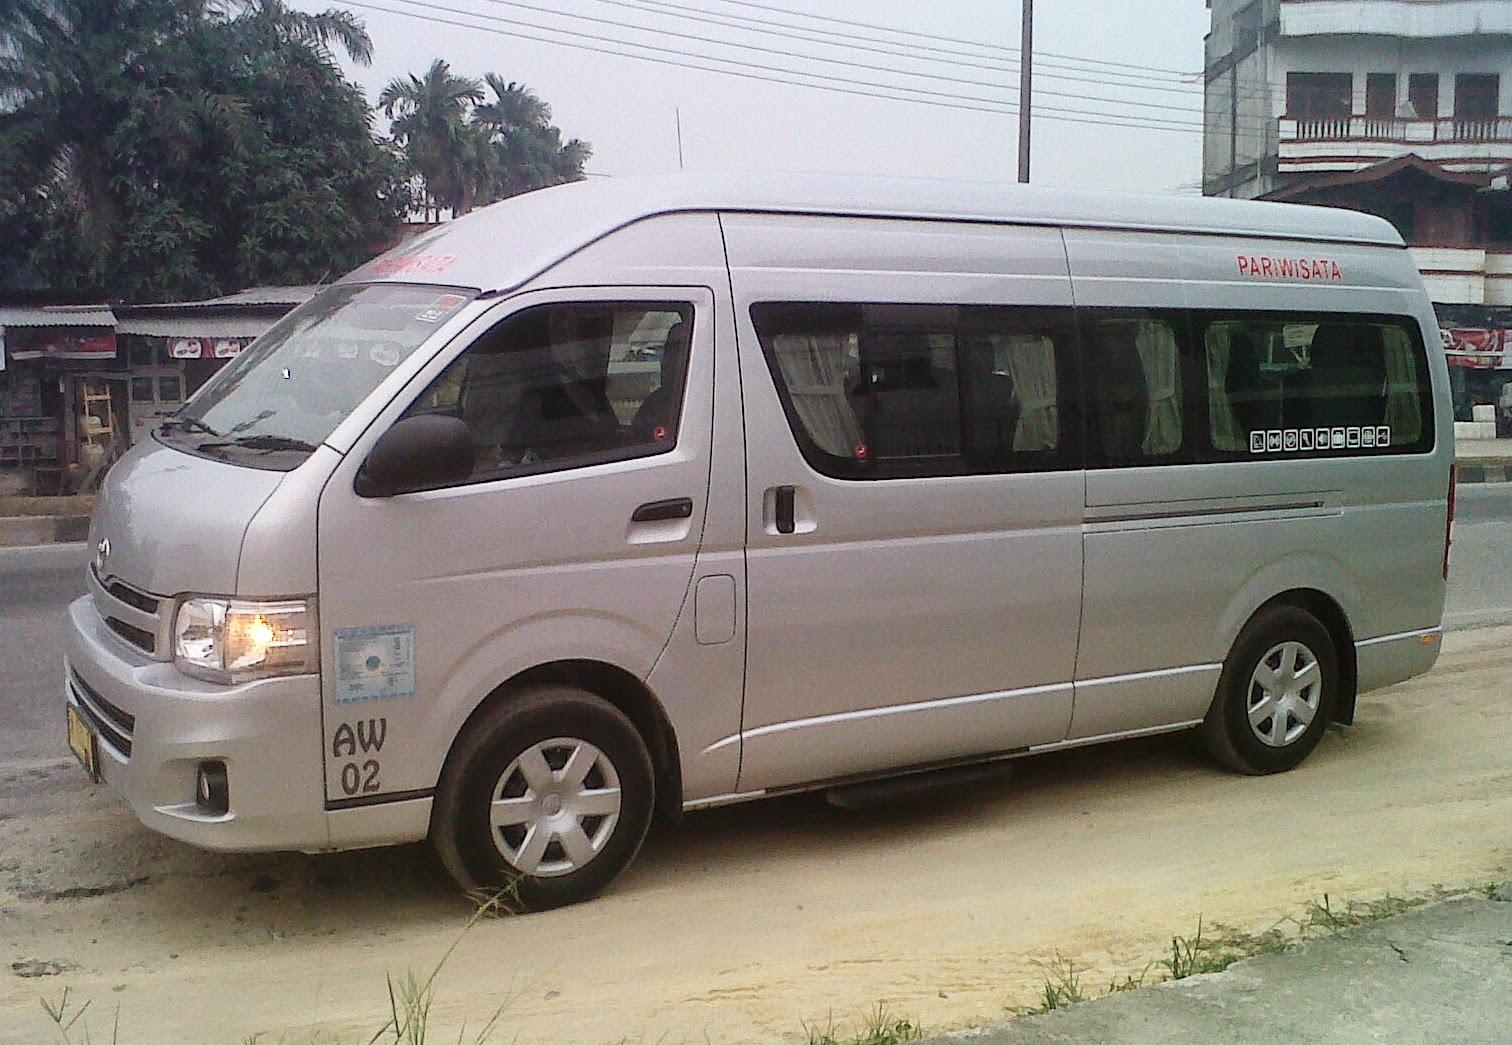 sewa mobil minibus pekanbaru rental mobil minibus pekanbaru. Black Bedroom Furniture Sets. Home Design Ideas